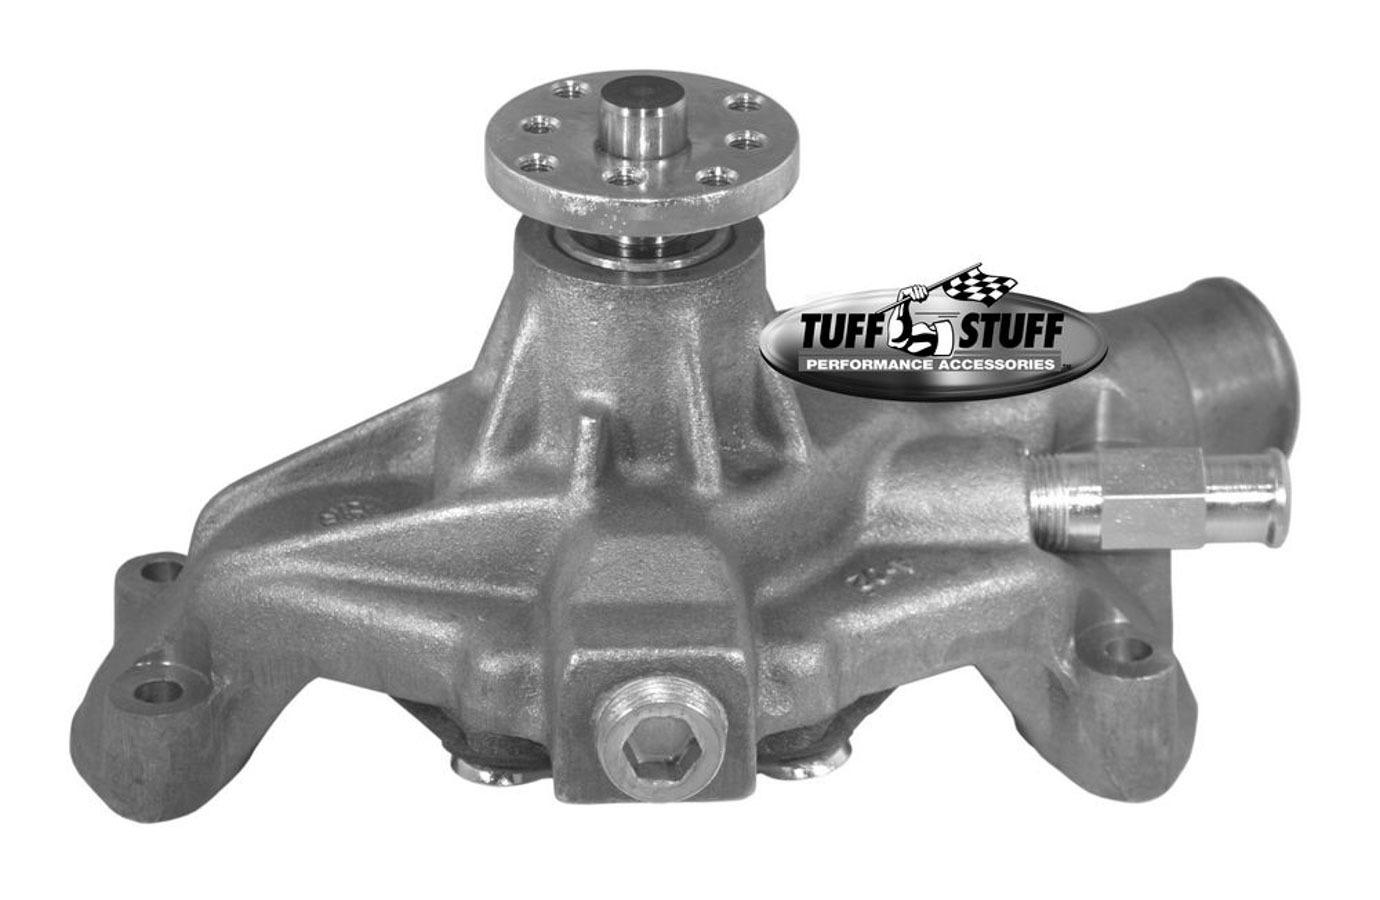 Tuff-Stuff 1534N Water Pump, Mechanical, SuperCool, High Volume, Short Design, Iron, Natural, Small Block Chevy, Each